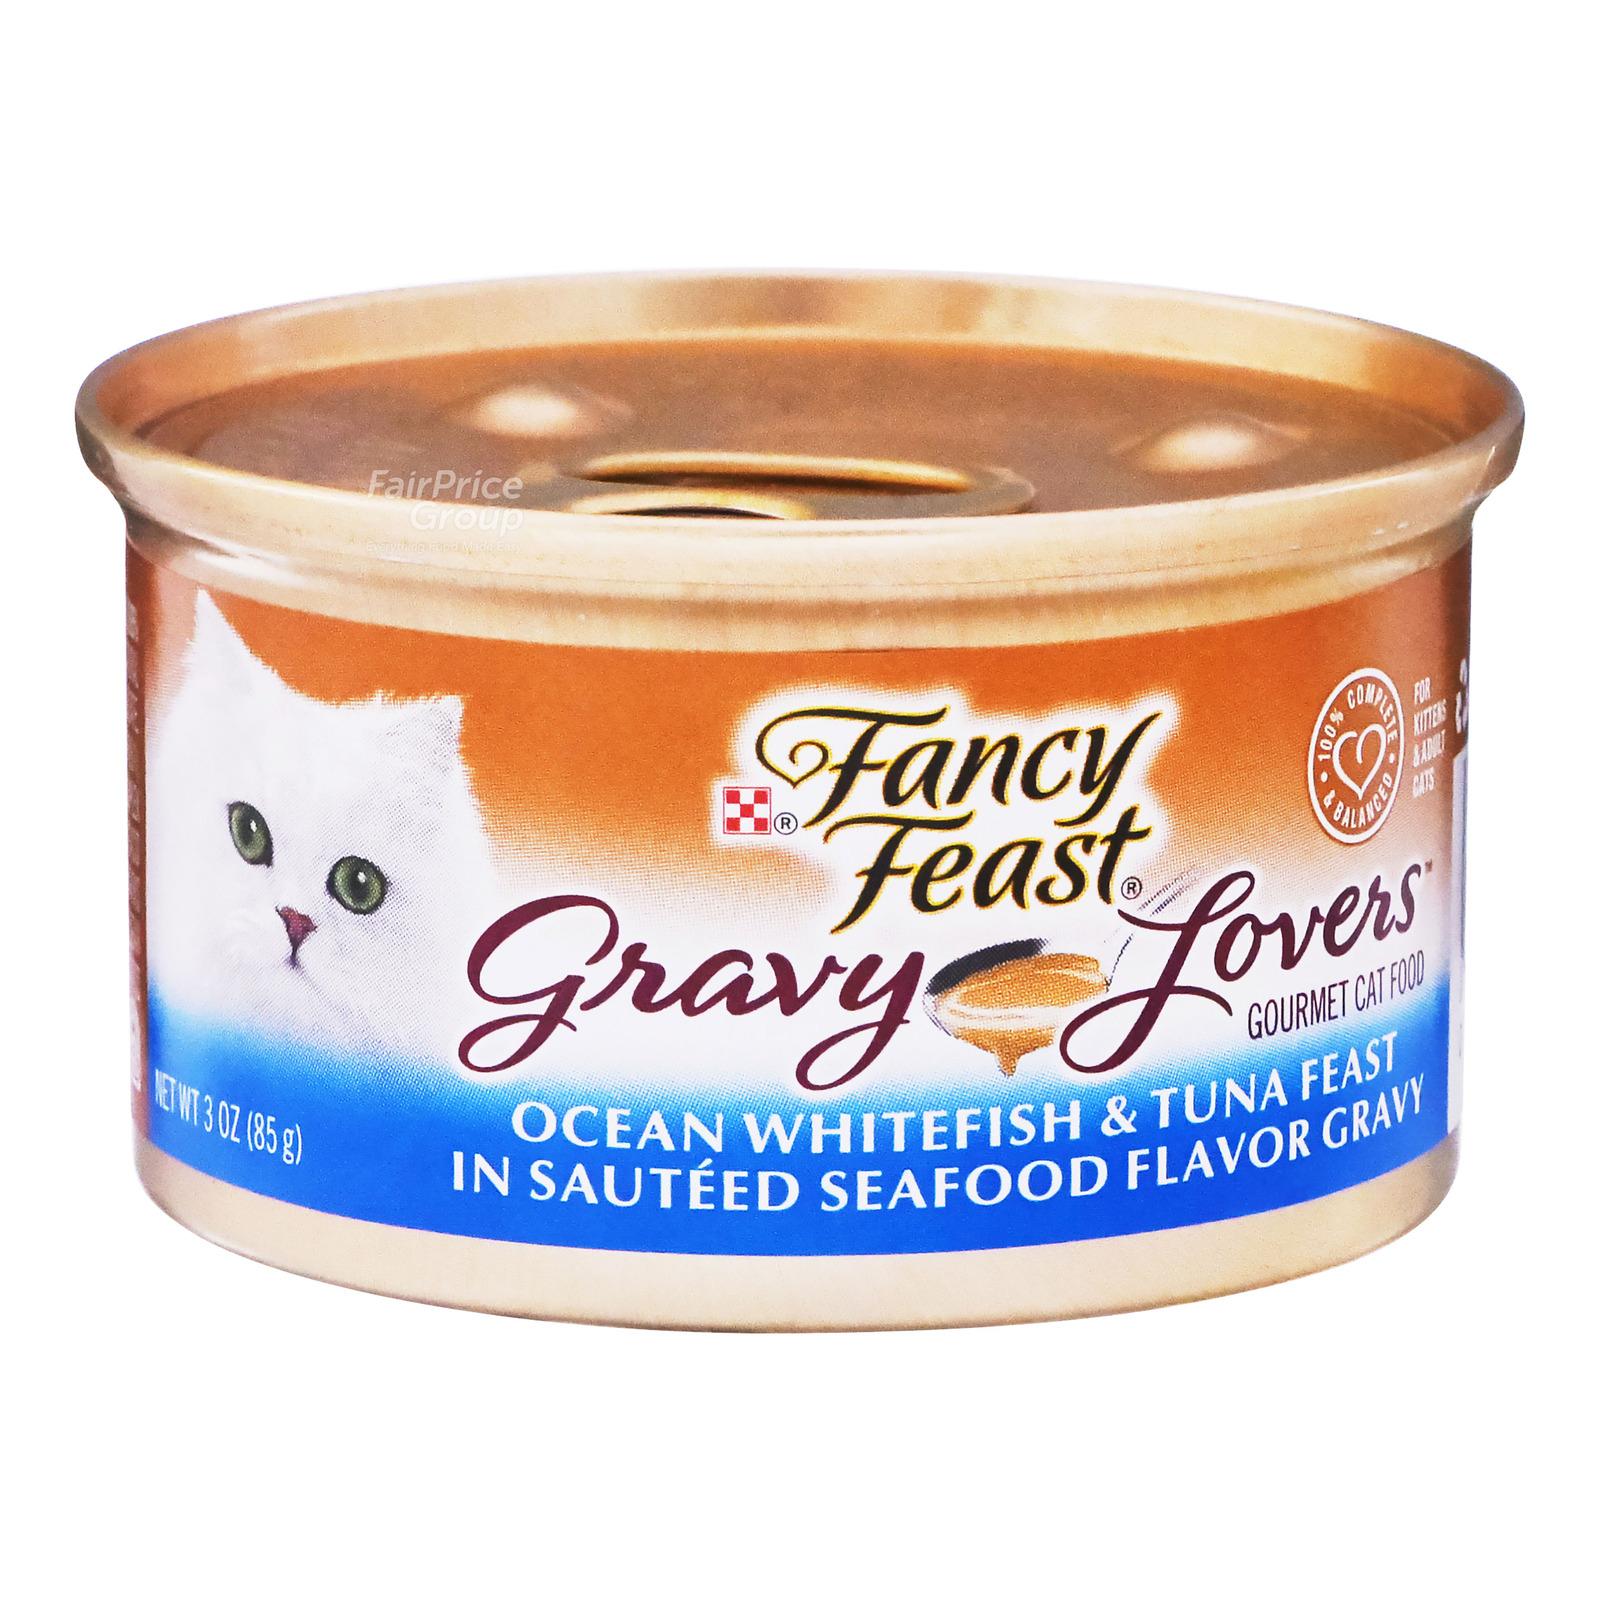 Fancy Feast Gravy Lovers Cat Food - Ocean Whitefish & Tuna